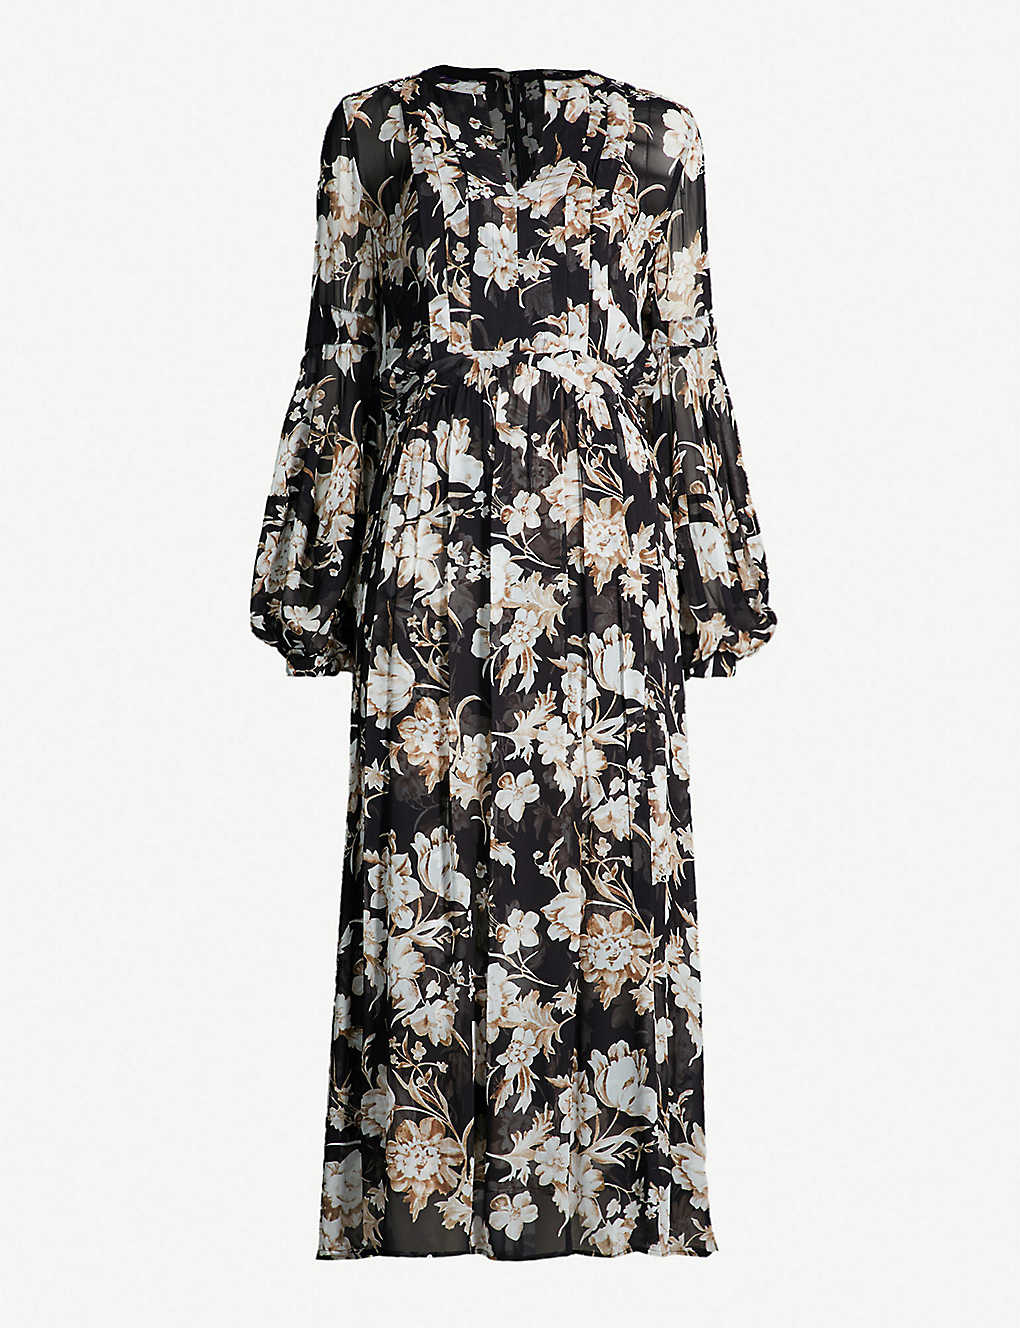 6f947e8515 THE KOOPLES - Floral-print crepe midi dress | Selfridges.com